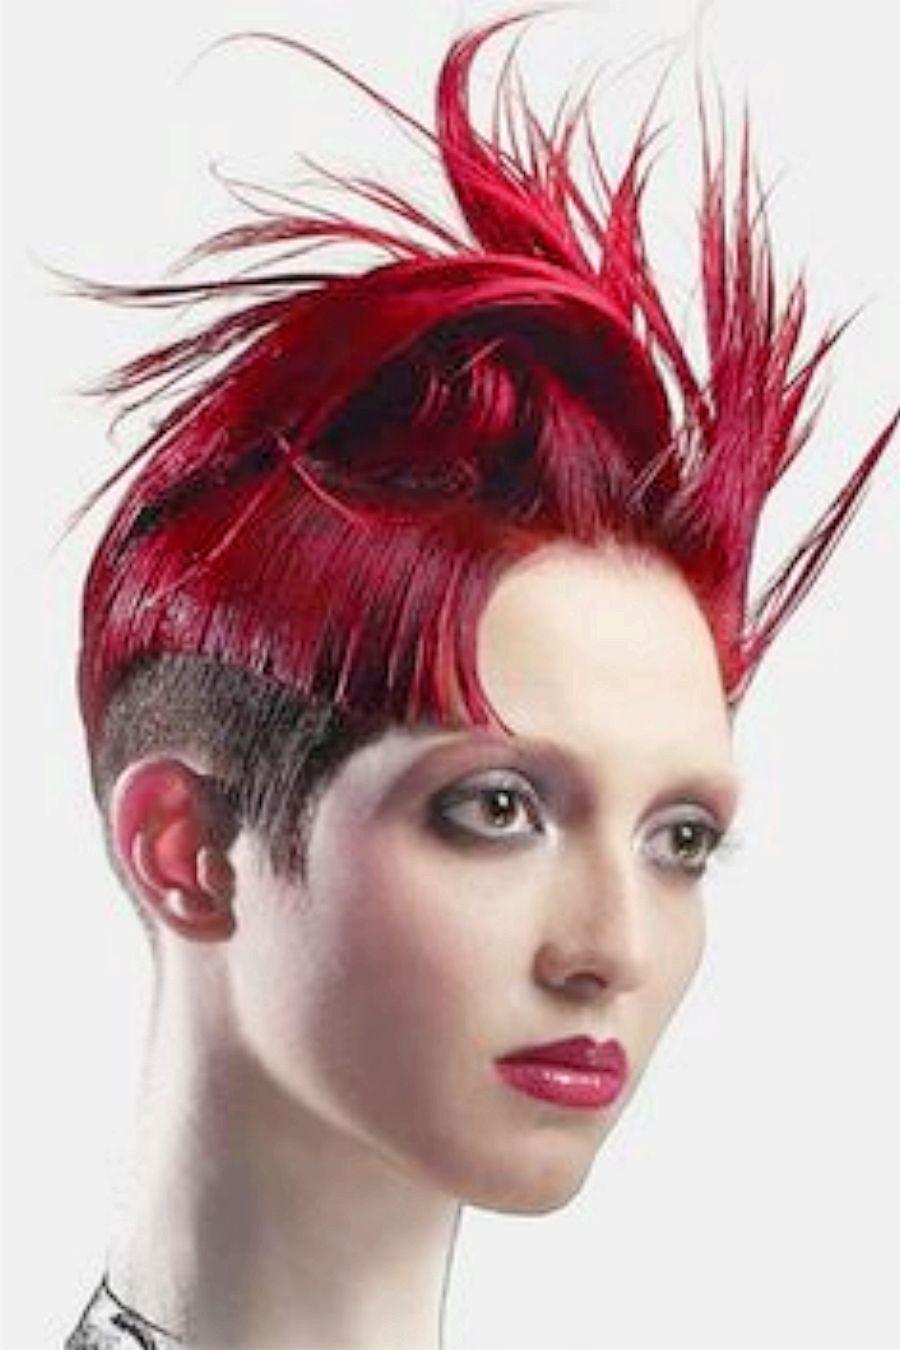 Fotos Top 10 cortes de pelo originales Pelo fosco el look  - Cortes De Pelo Originales